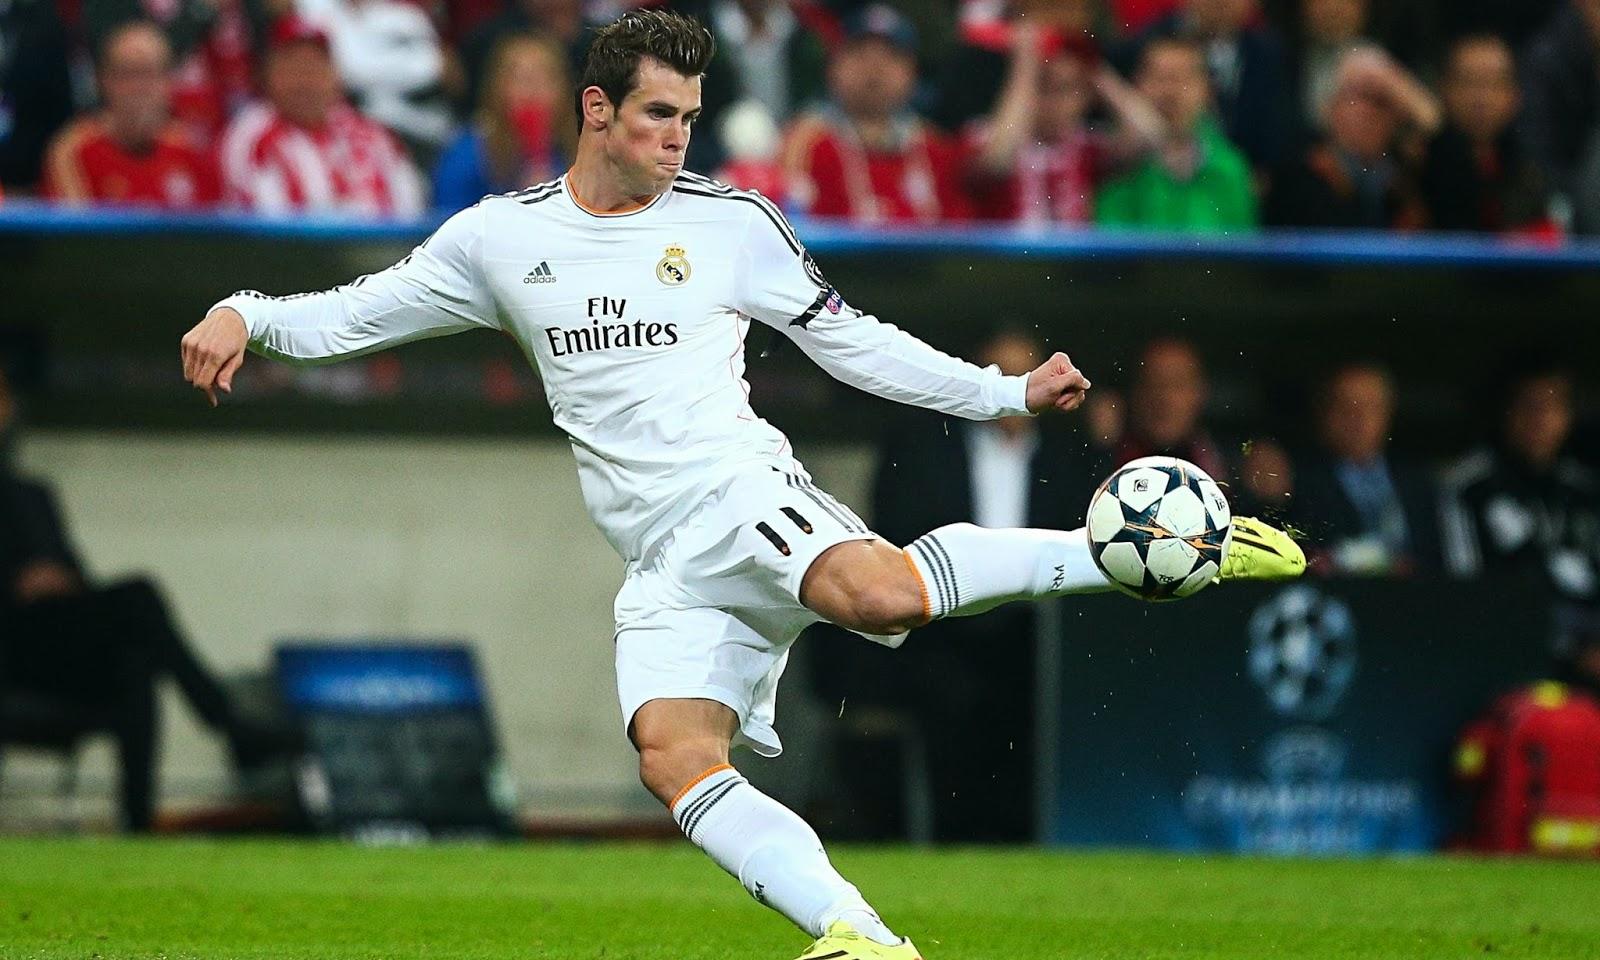 SBOBET - Bale Didukung Oleh Para Fans